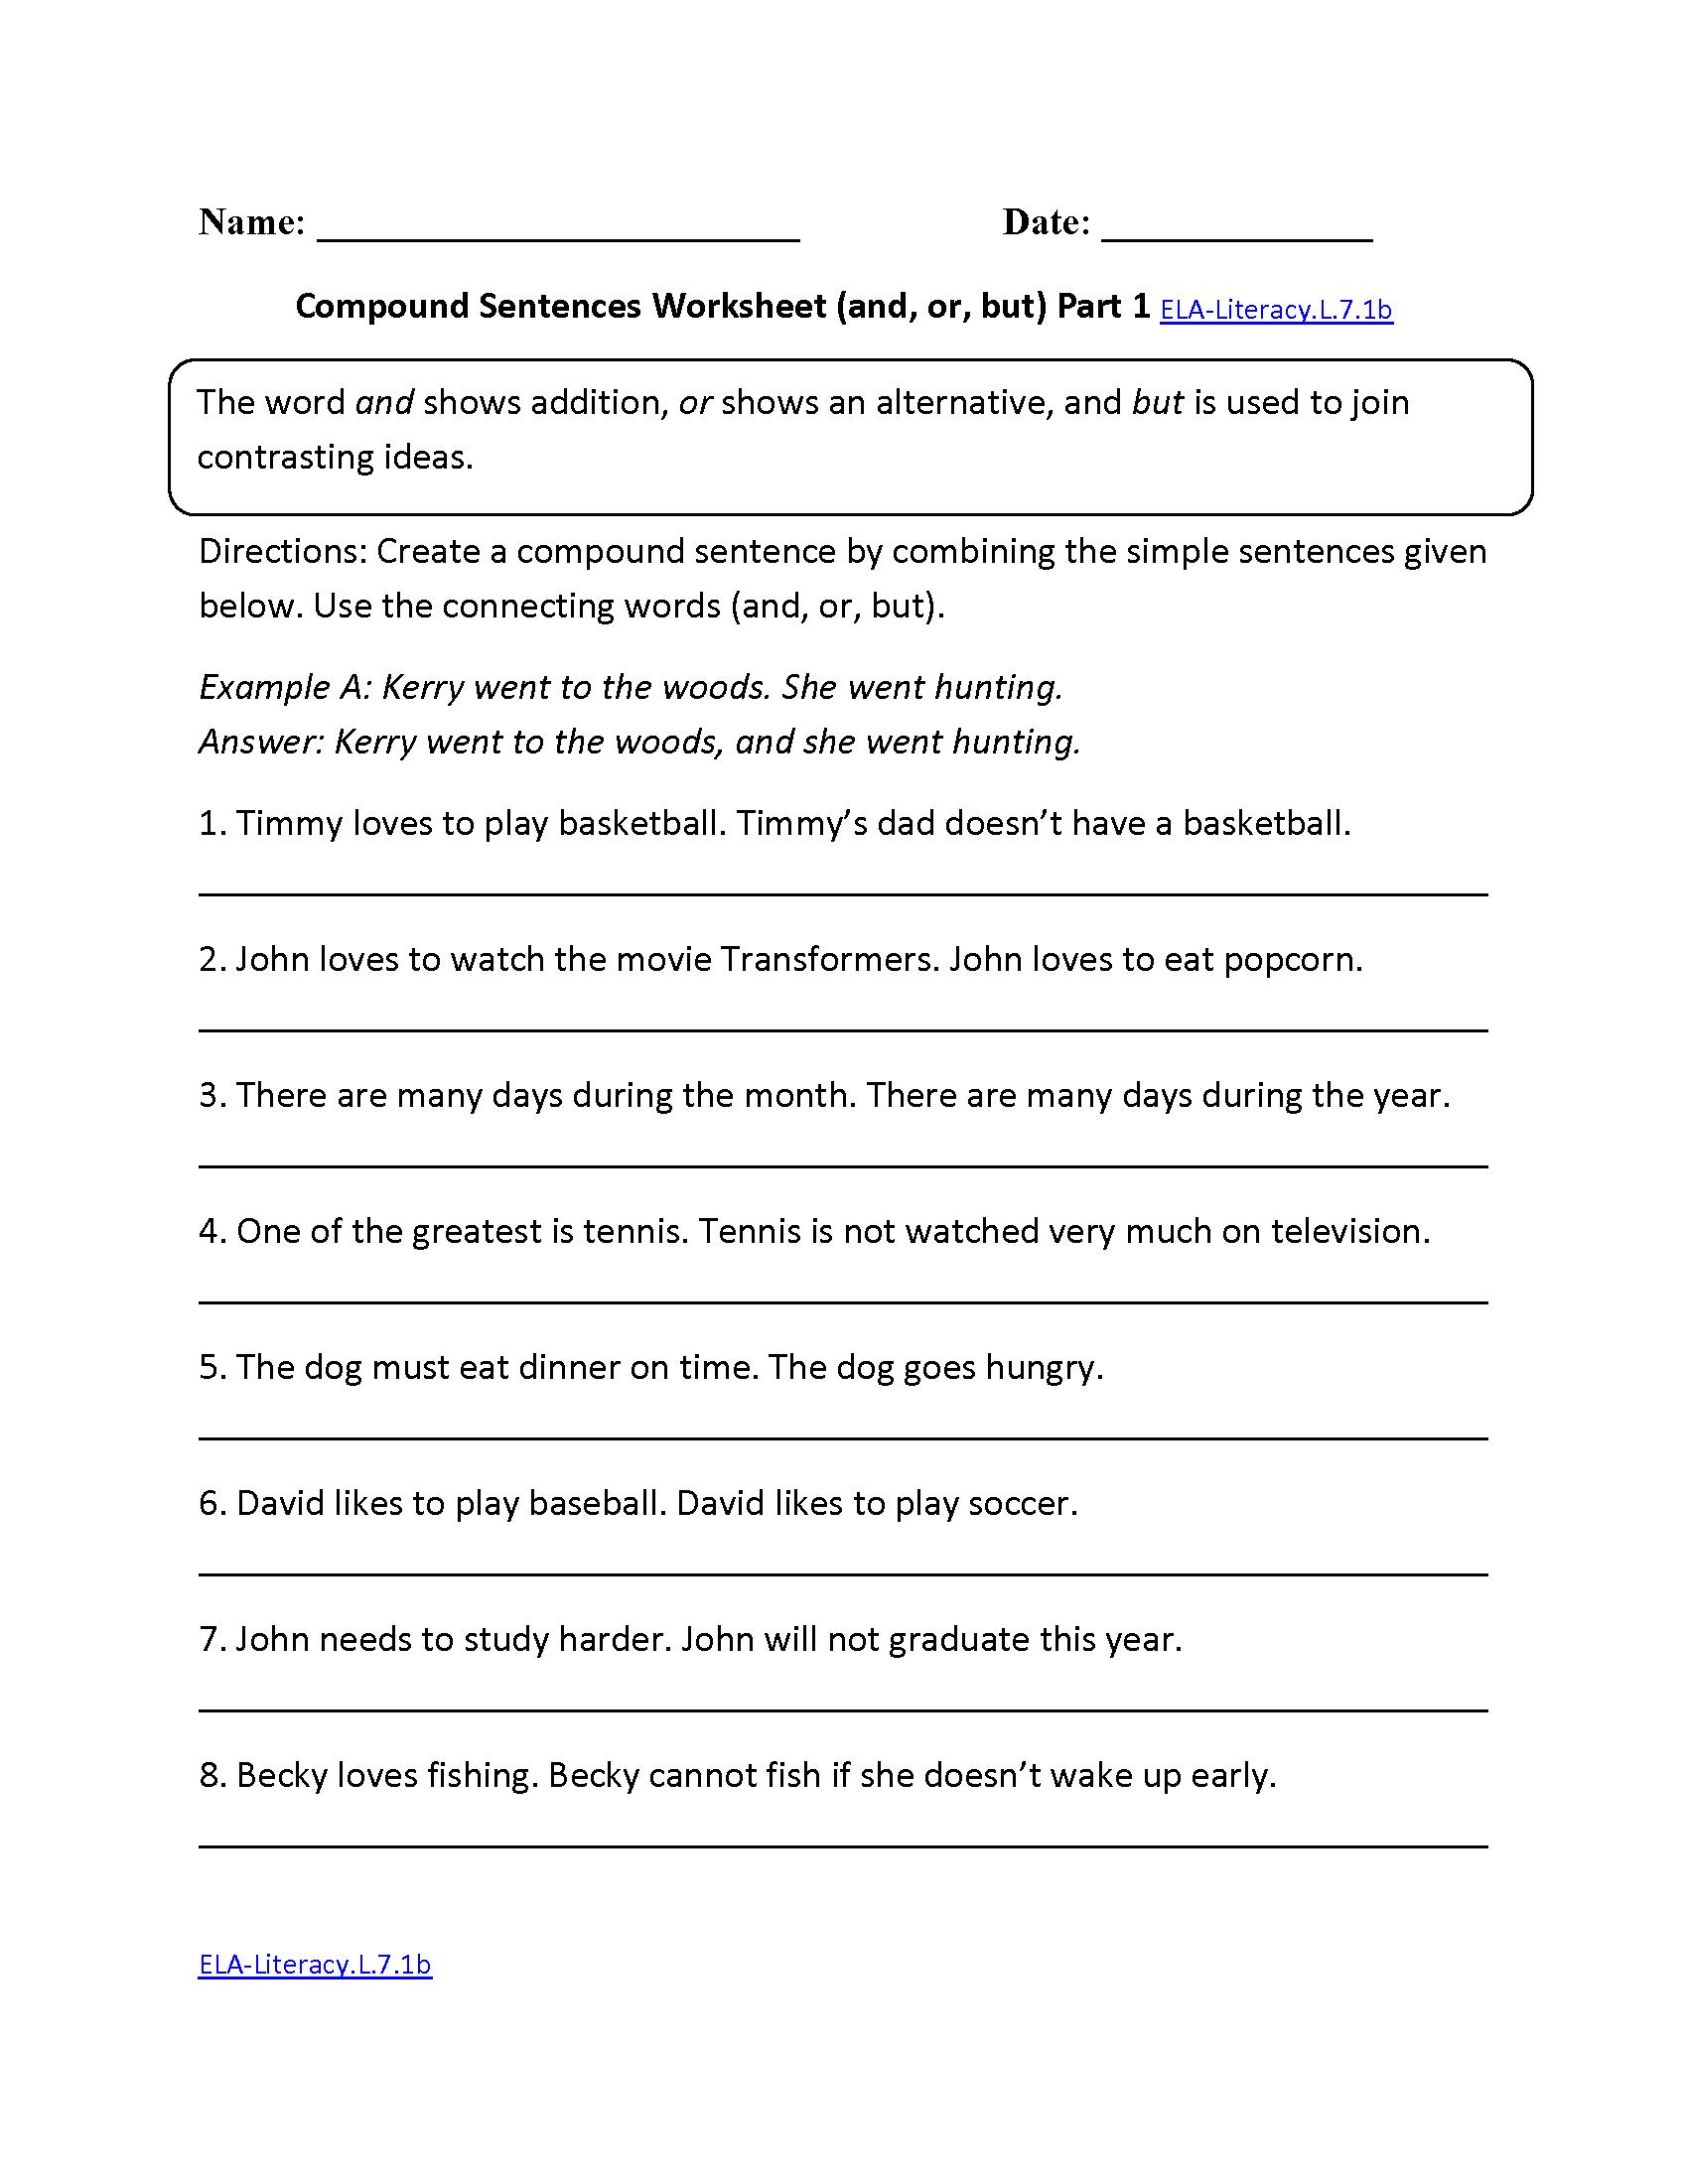 Compound Sentences Worksheet ELA-Literacy.L.7.1b Language ...